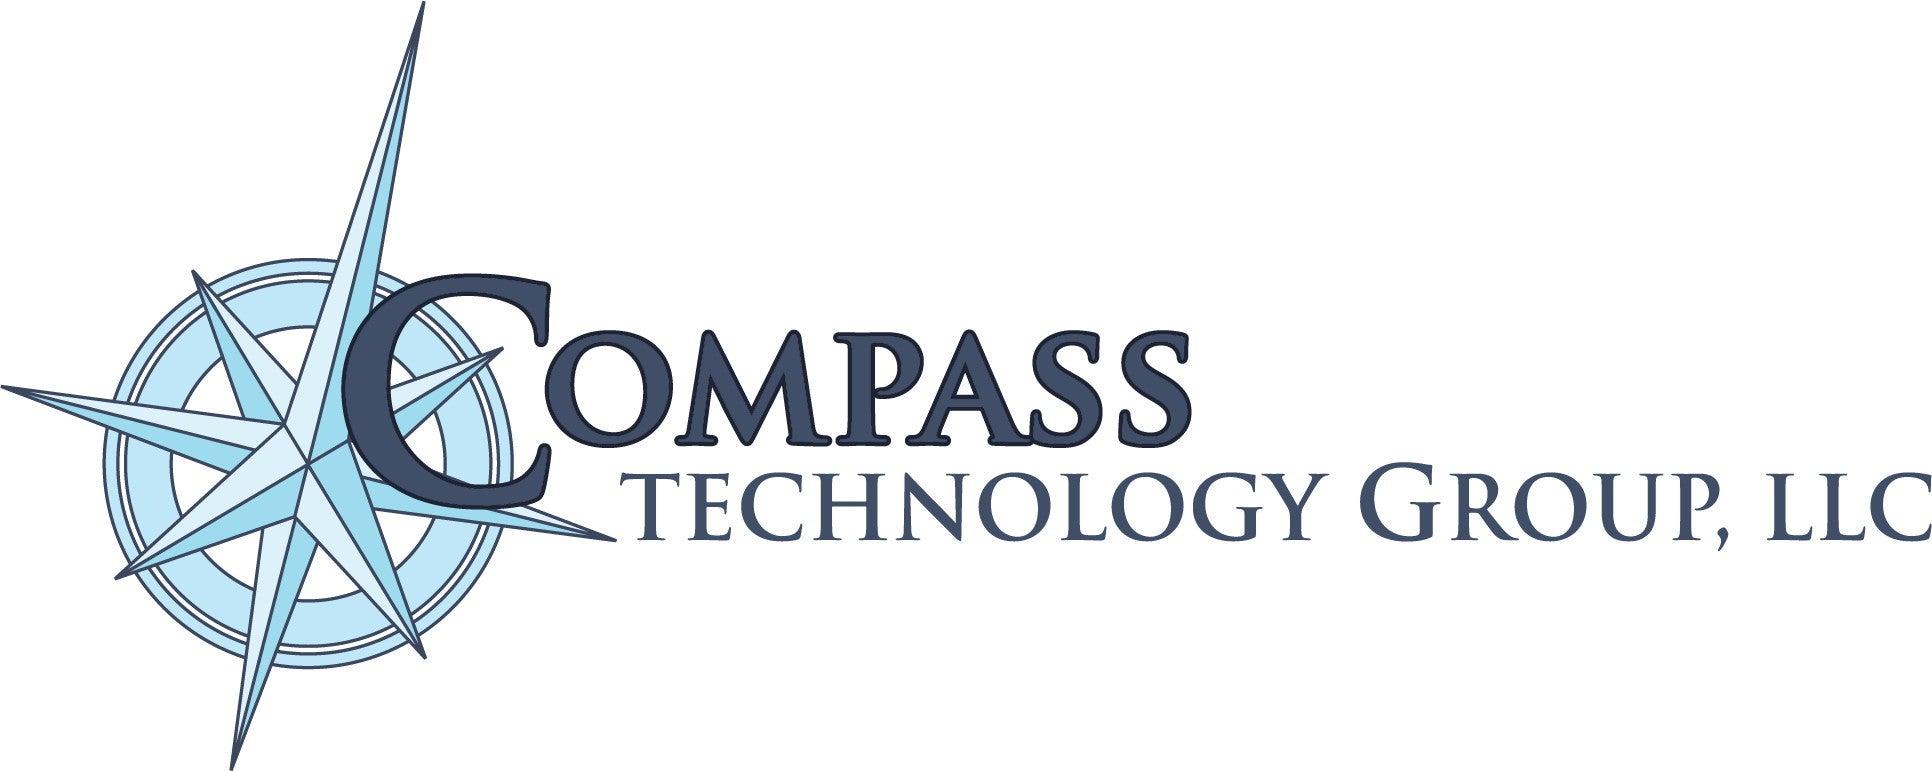 Compass Technology Group